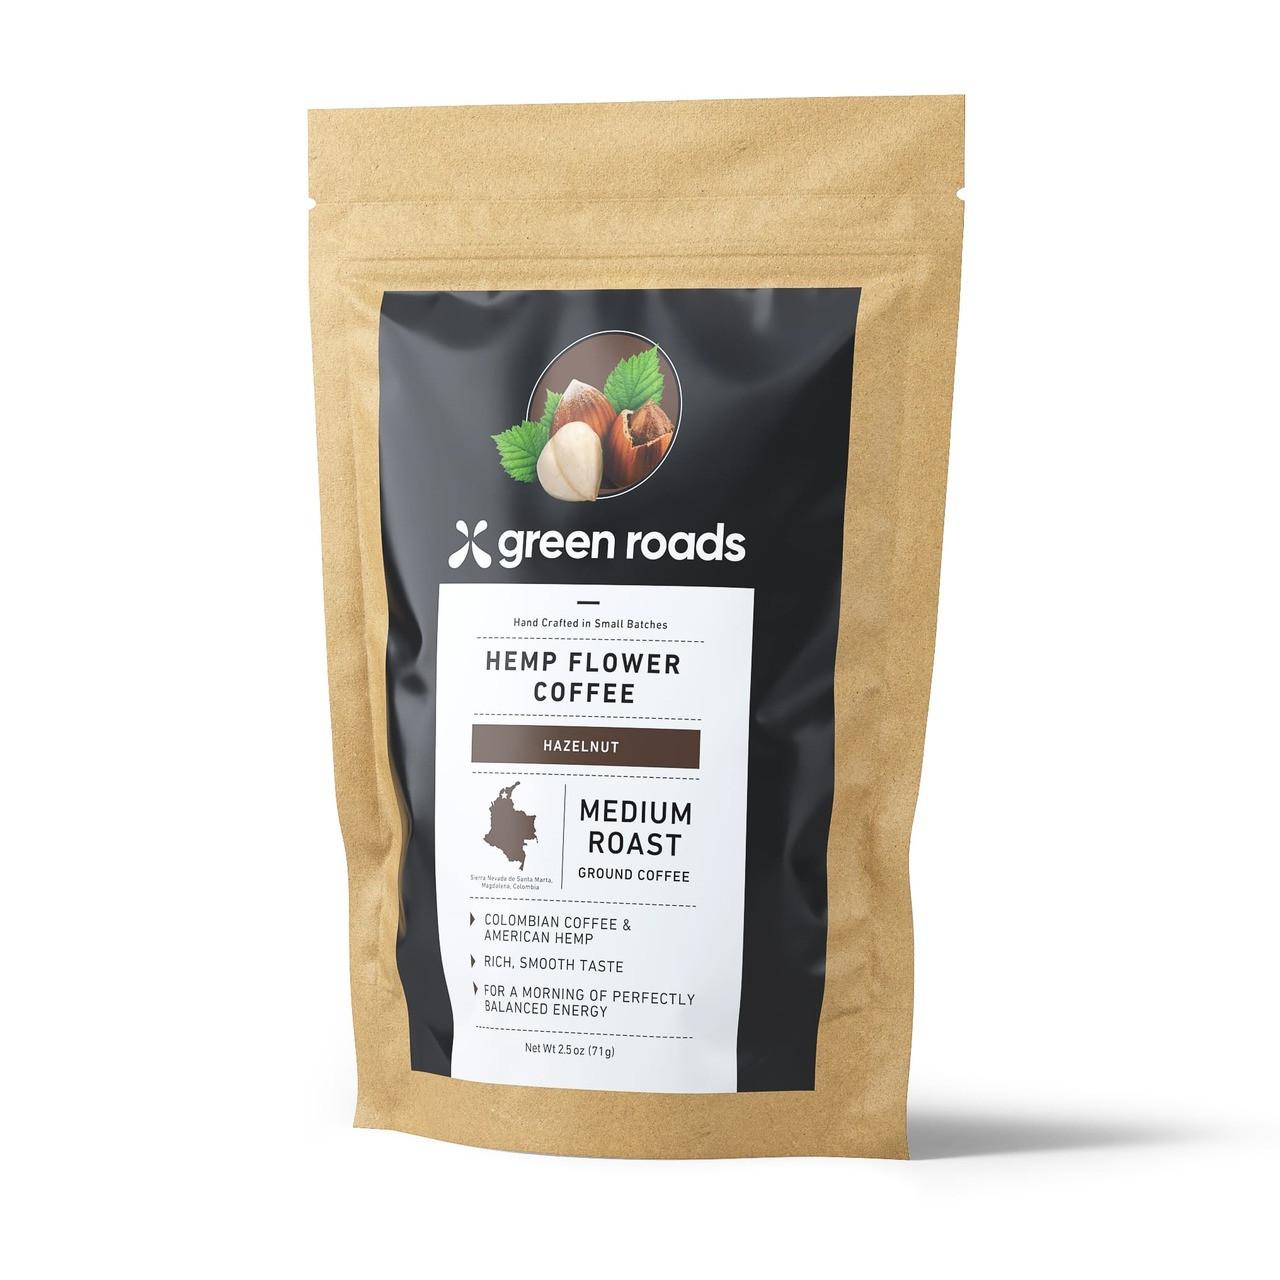 Green Roads Hemp Flower Coffee 2.5 oz - Medium Roast Hazelnut